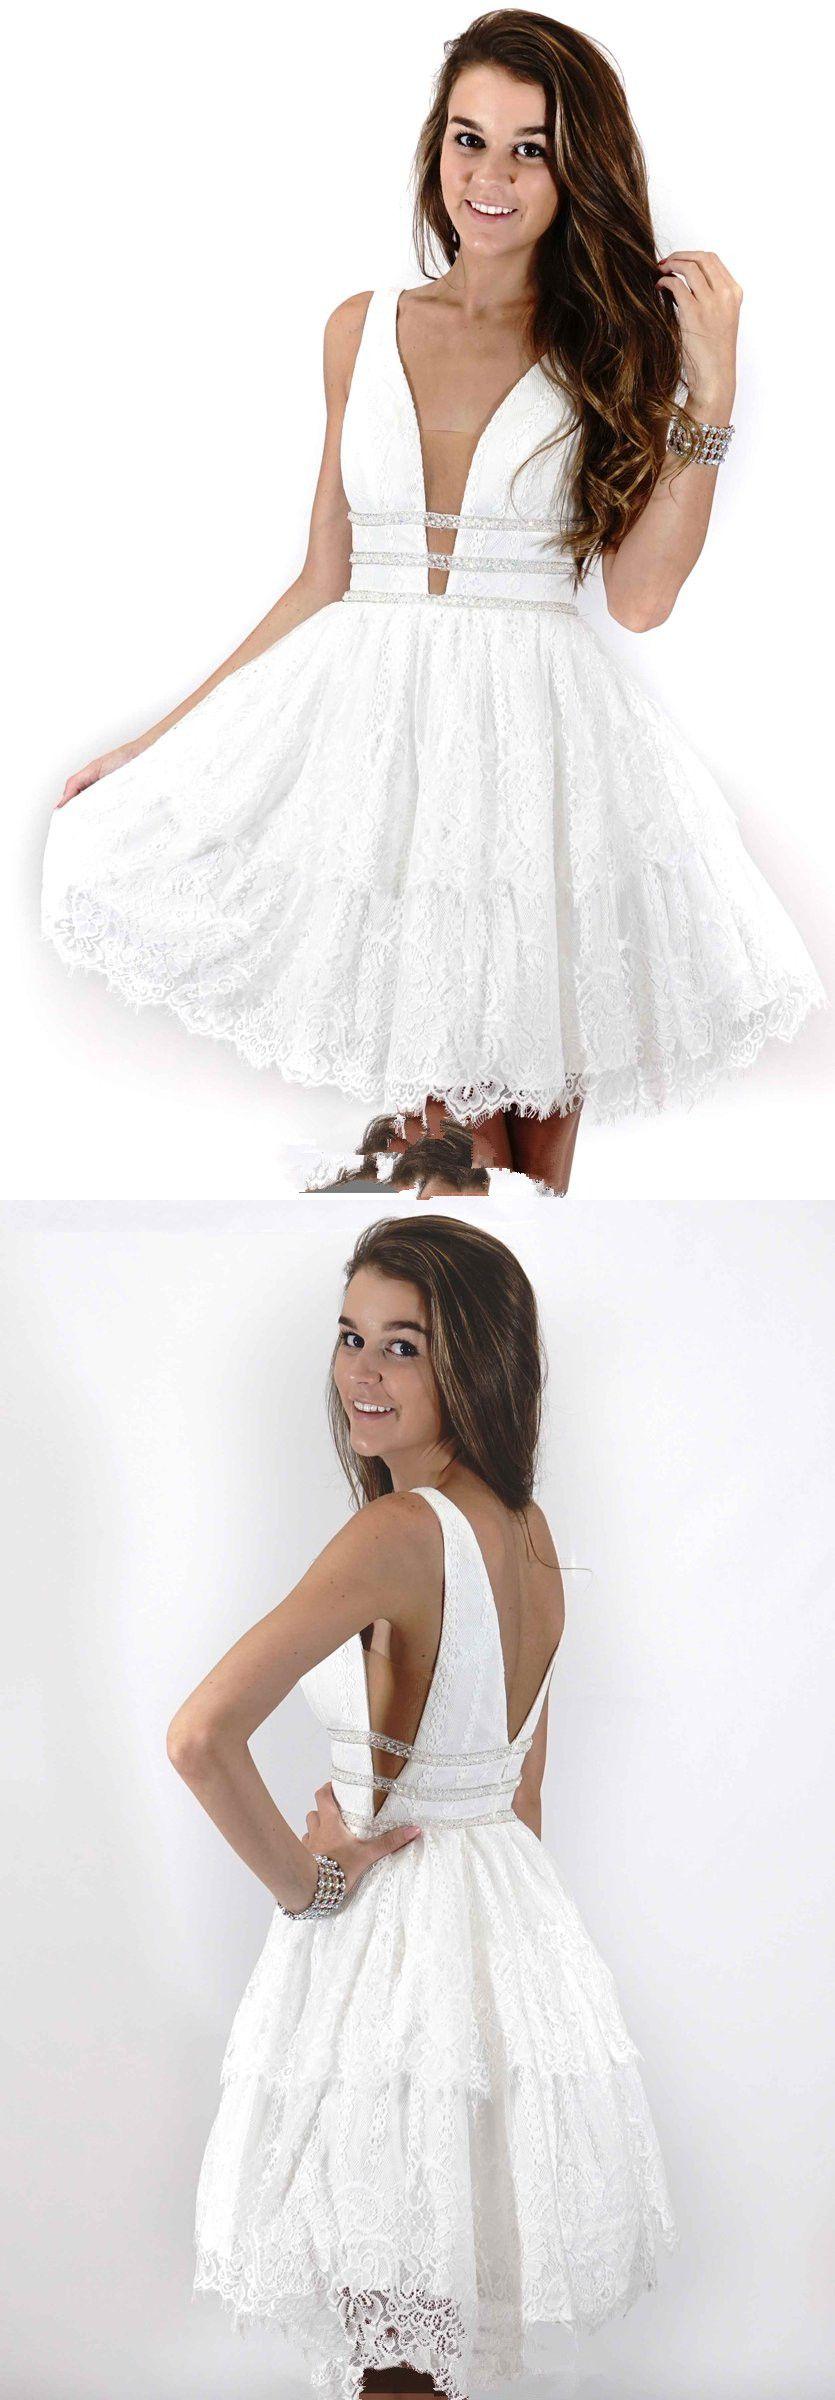 Short black lace homecoming dress elegant prom dresses